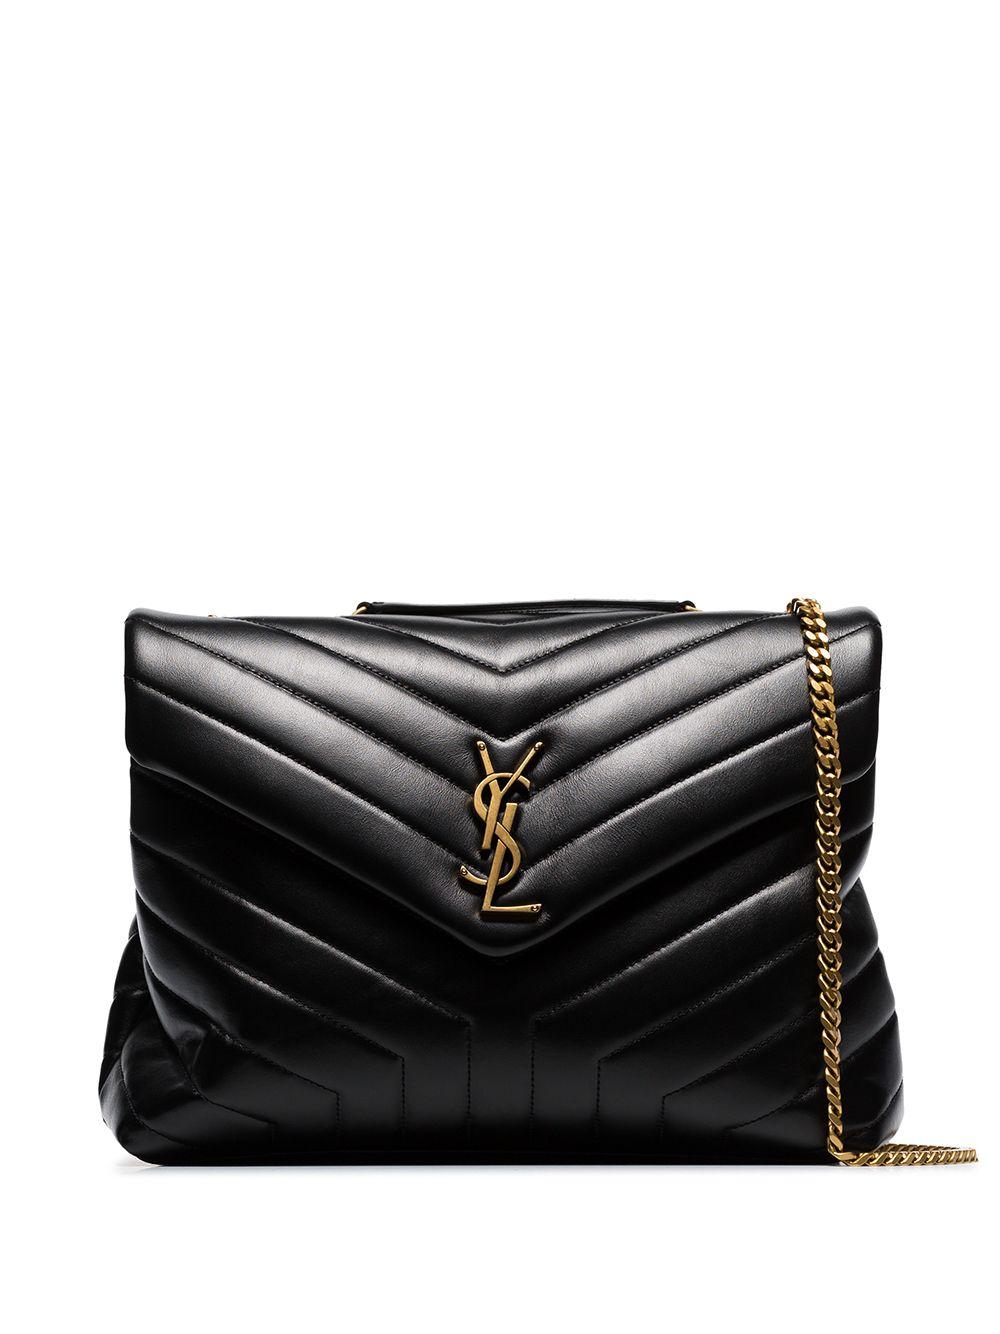 Picture of Saint Laurent | Medium Loulou Shoulder Bag